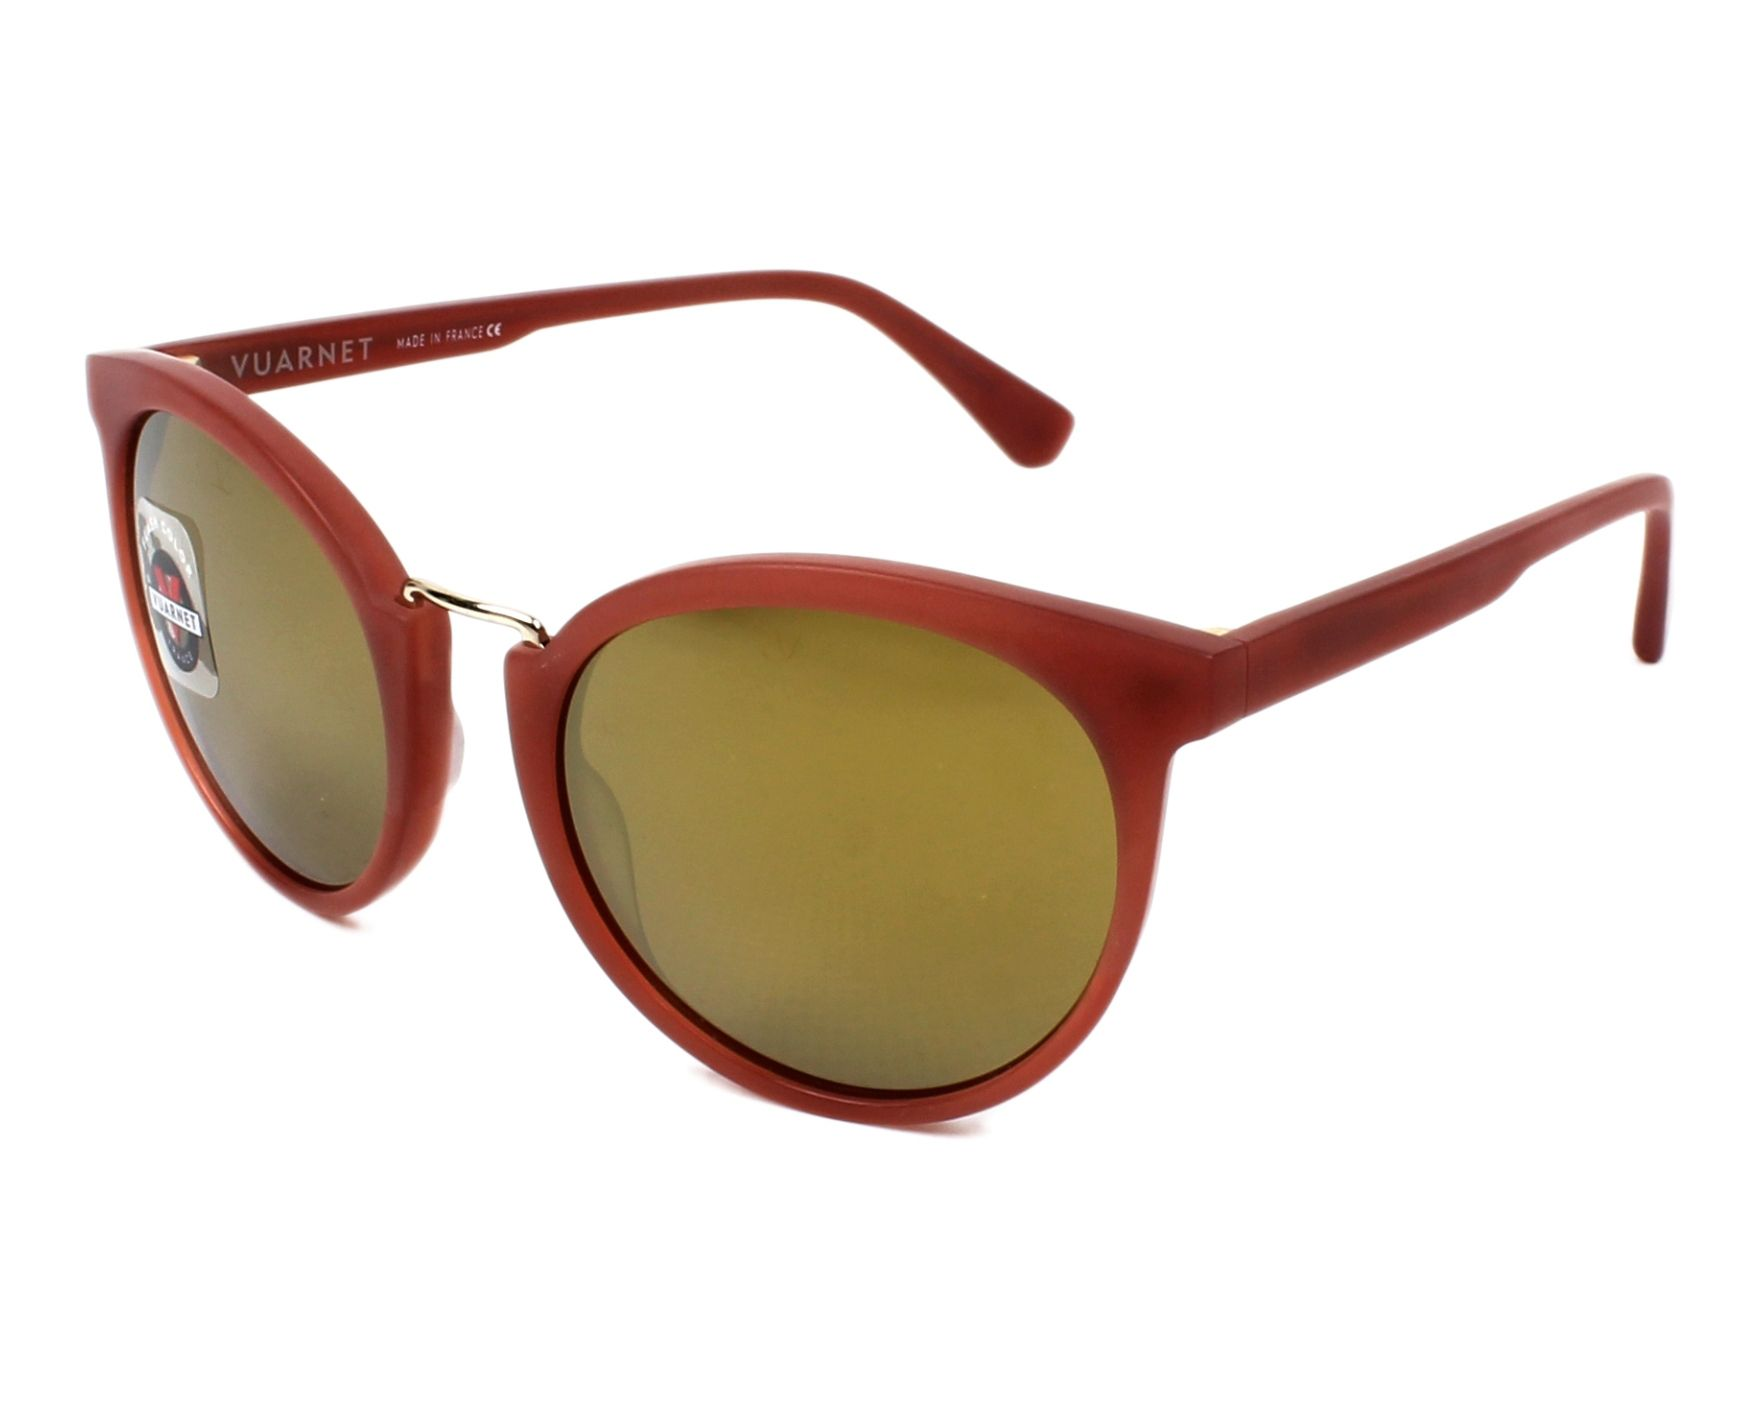 6a7927ae90e Sunglasses vuarnet bordeaux gold profile view jpg 1760x1408 Vuarnet cat eyes